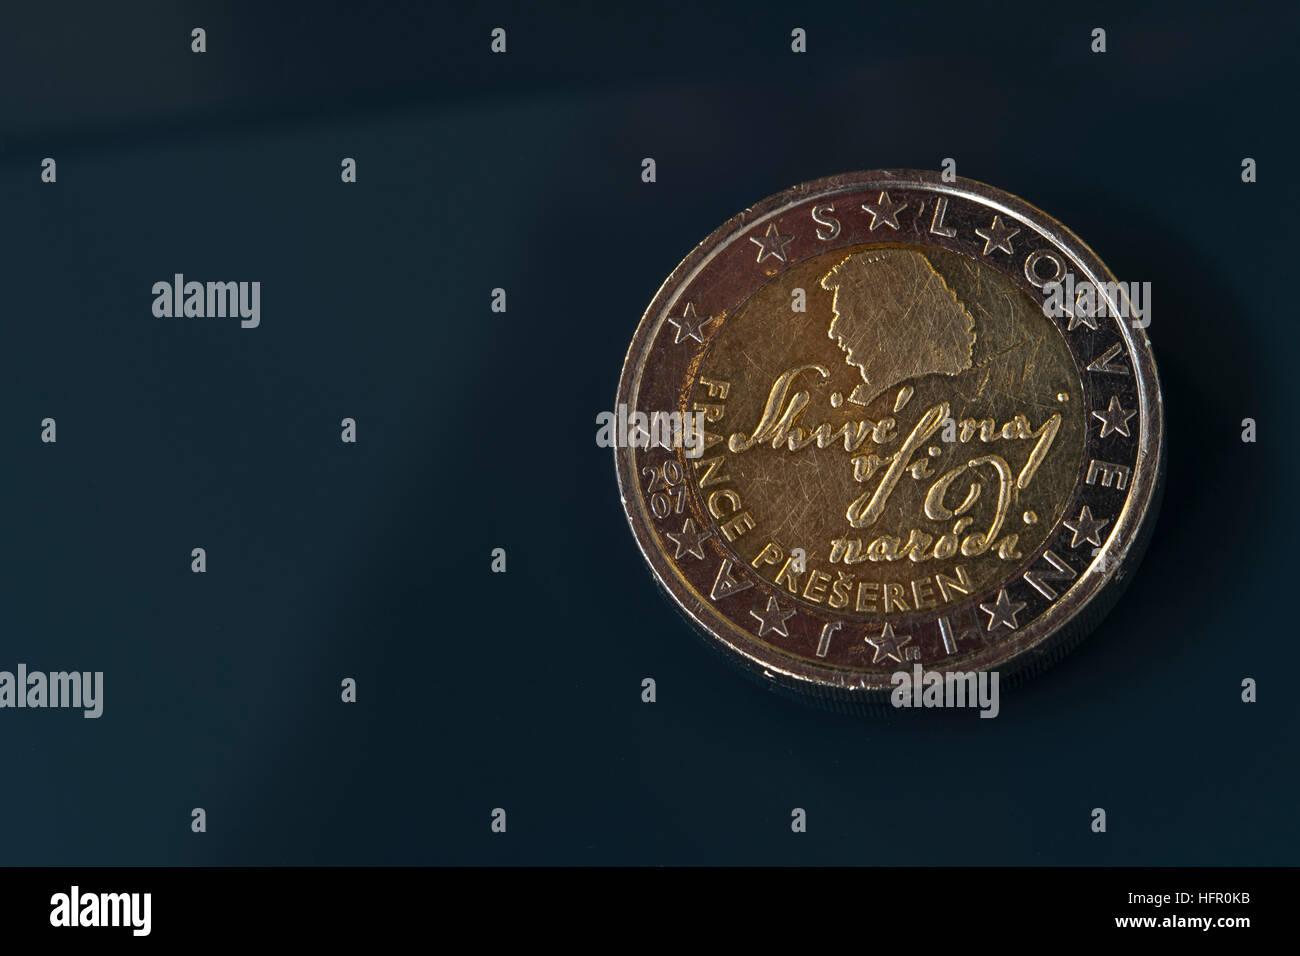 2 Euro Münze Slowenien Darstellung Berühmten Dichter France